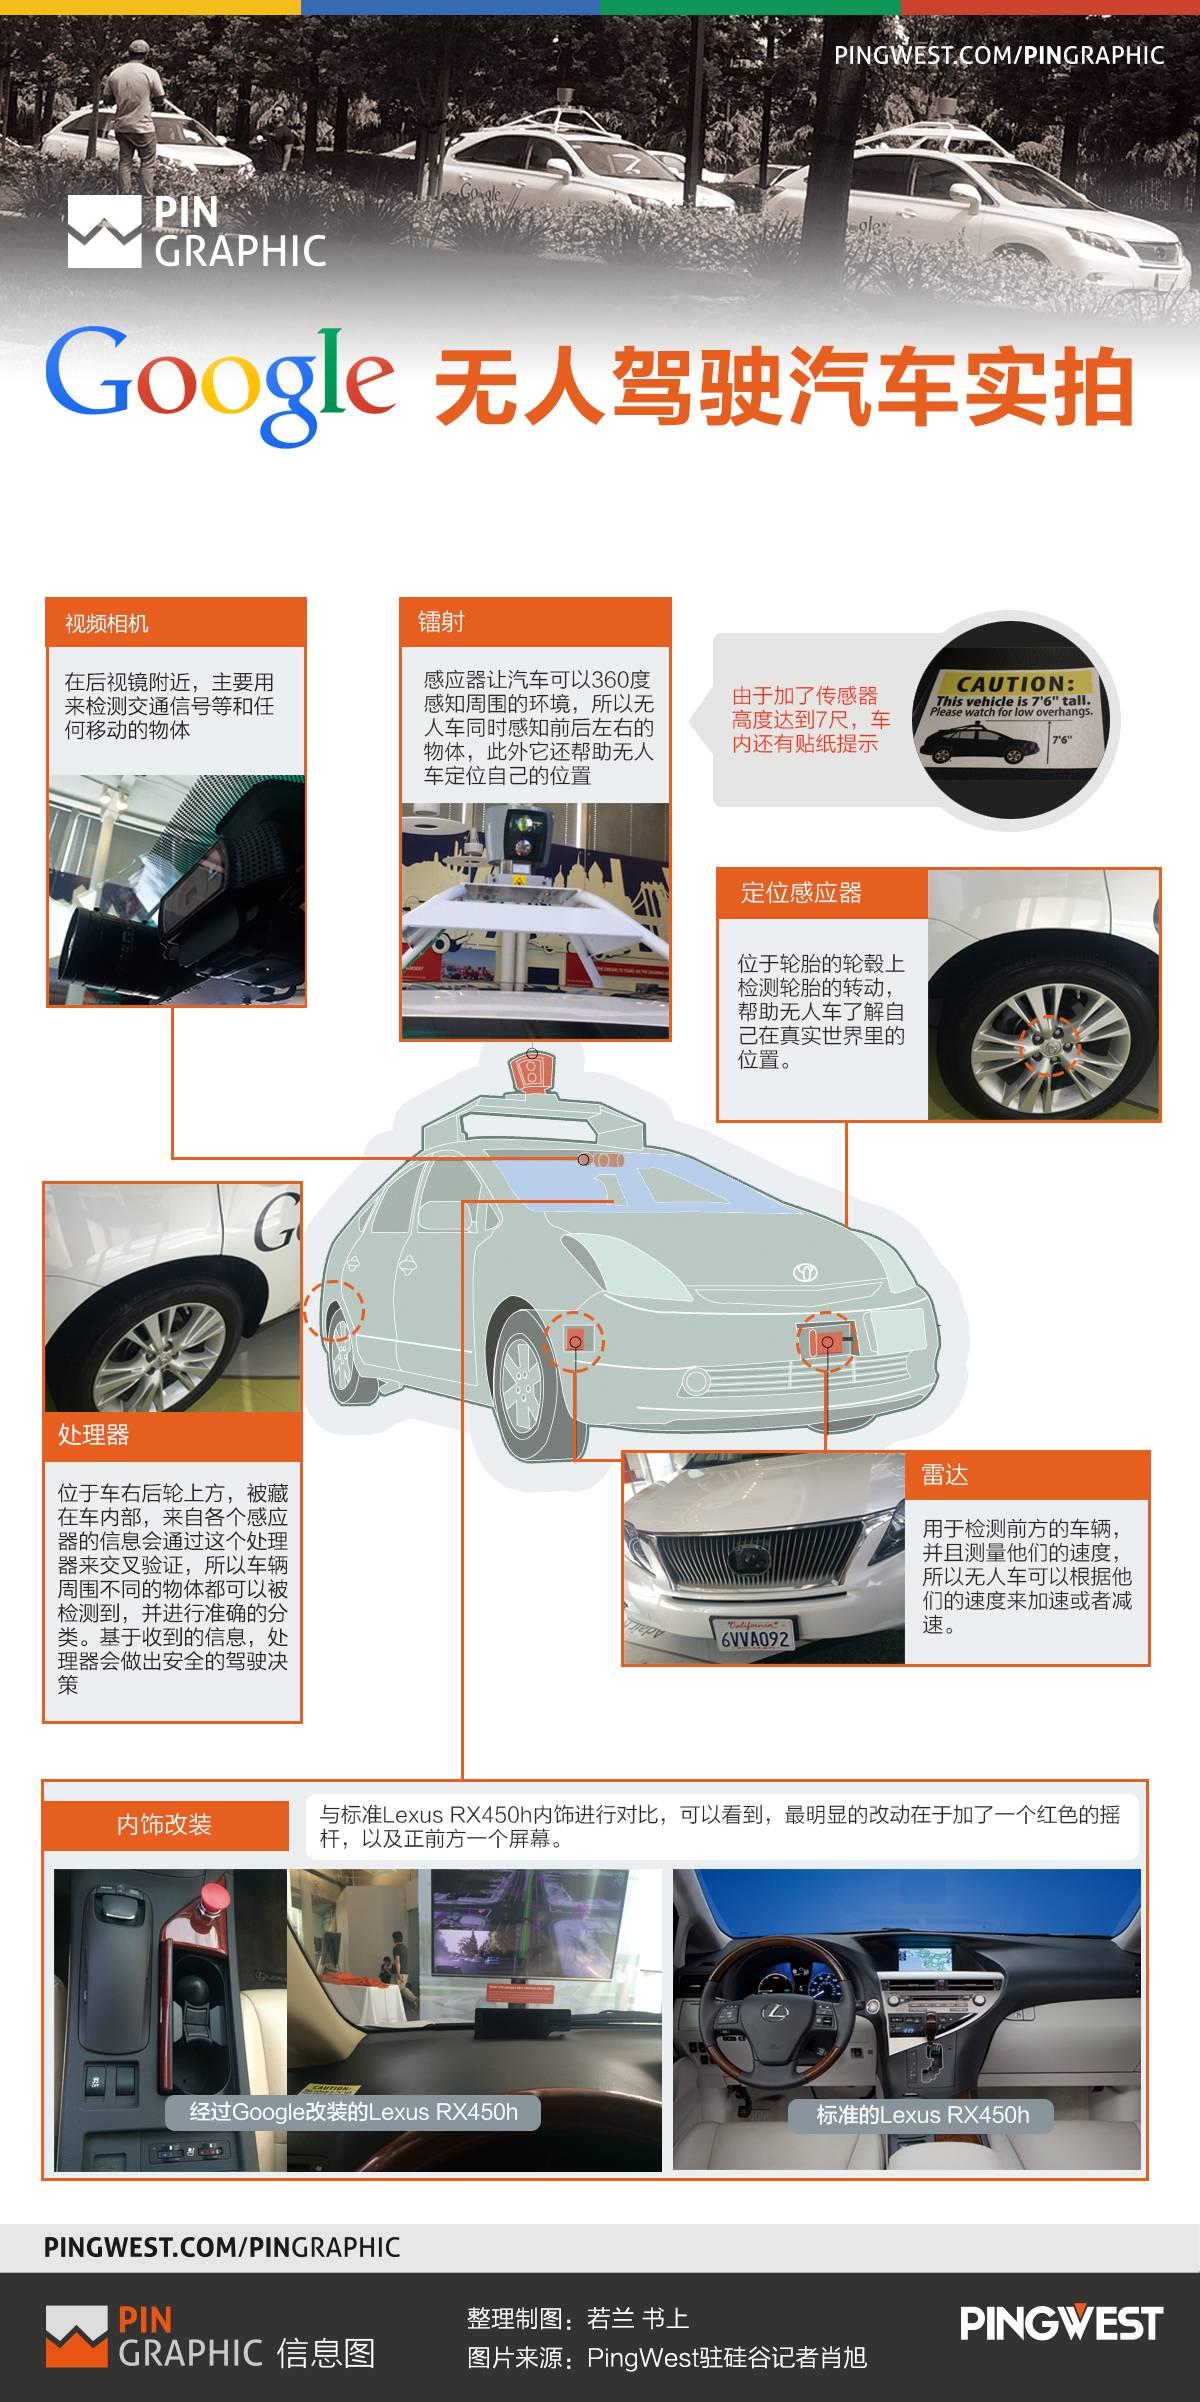 google-driverless-car6